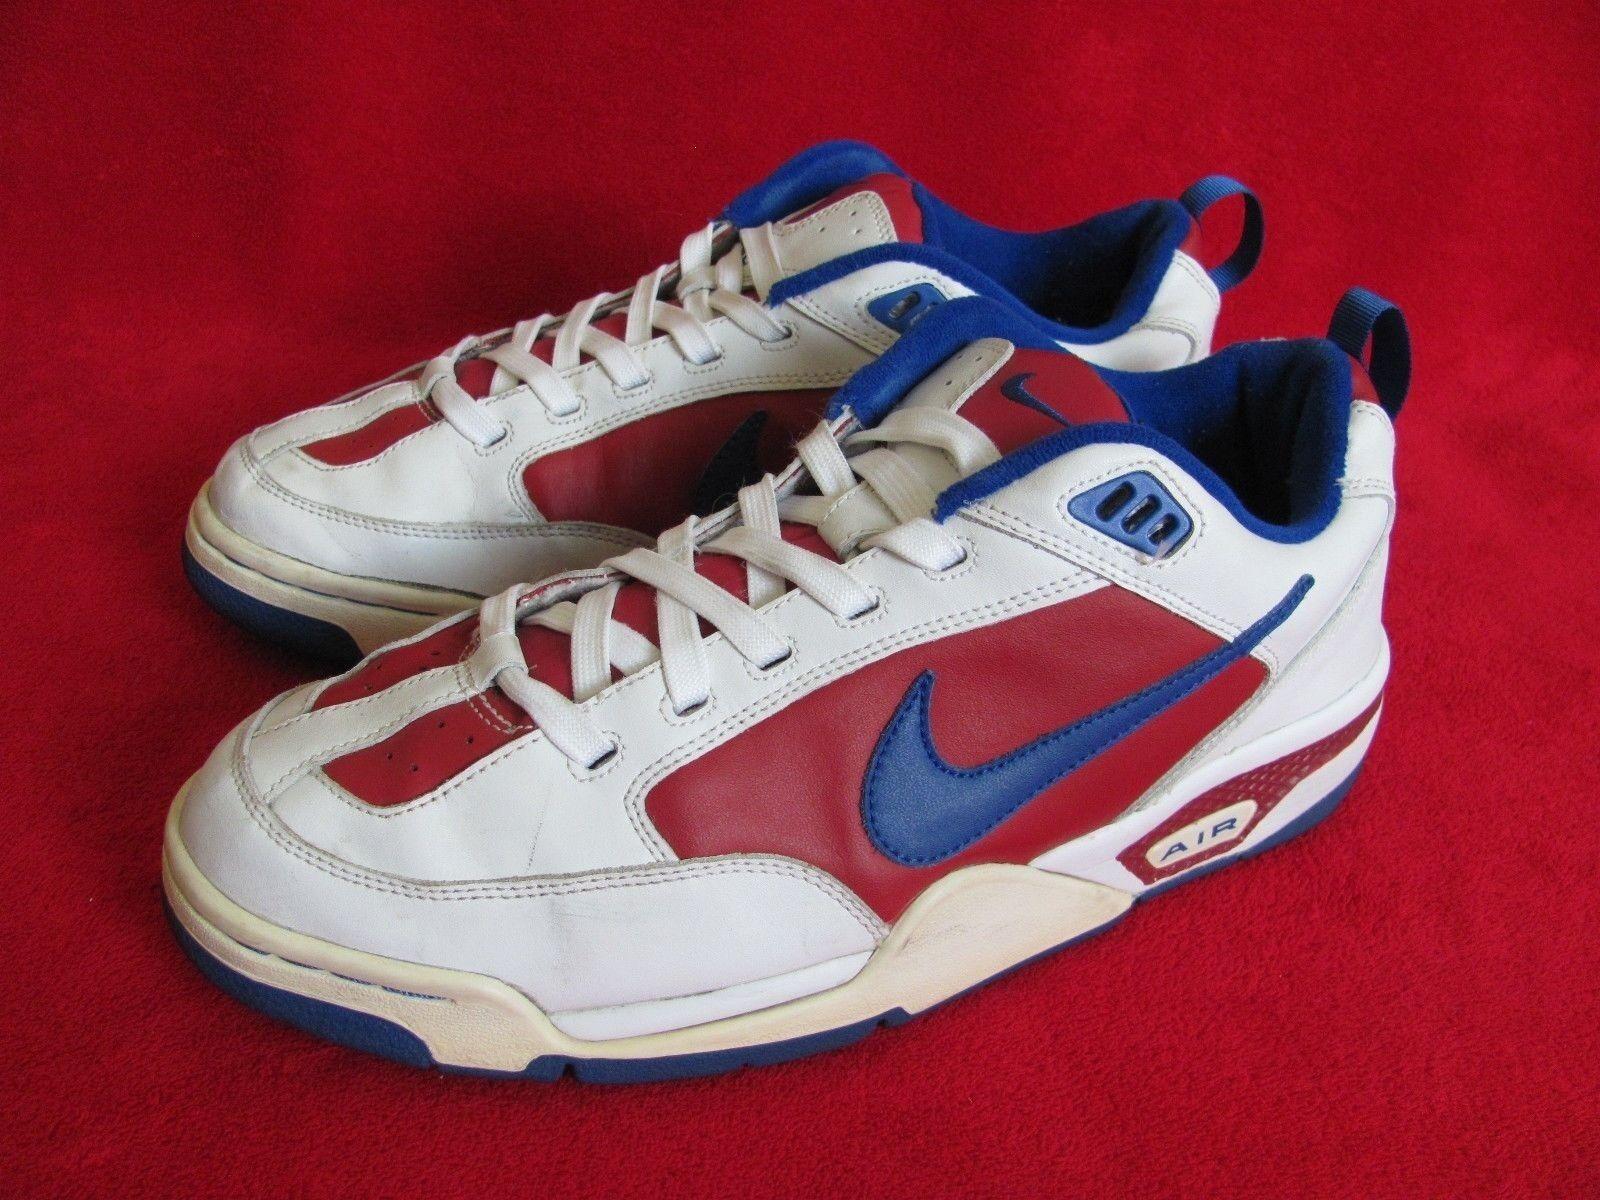 Nike Air  2004 Original  Red White Blue Men's Size US 11,